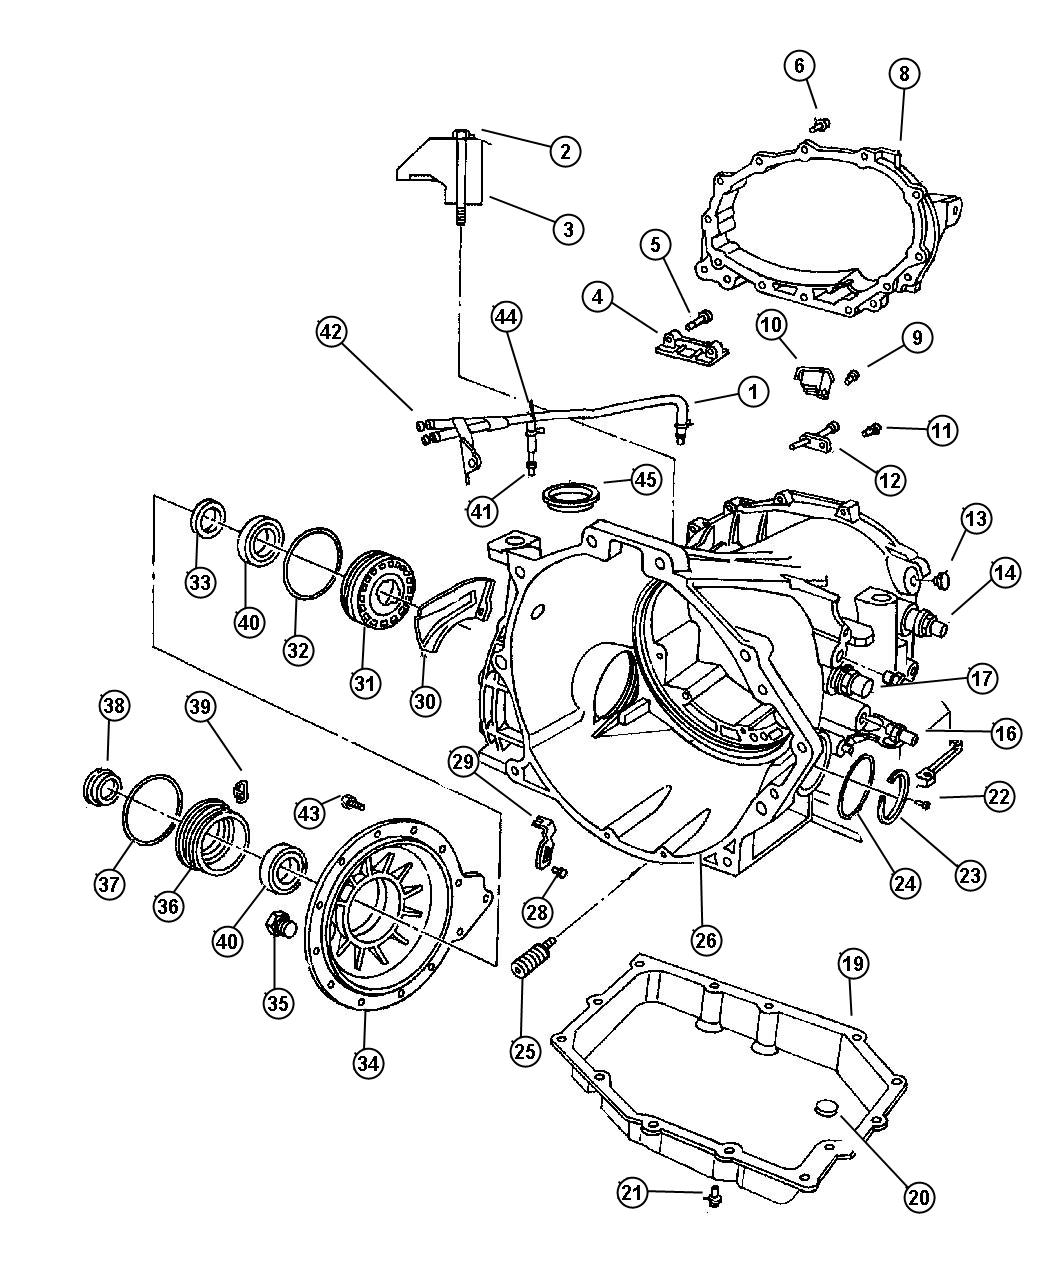 2000 Chrysler Concorde Cover. Transaxle rear. Chain / gear